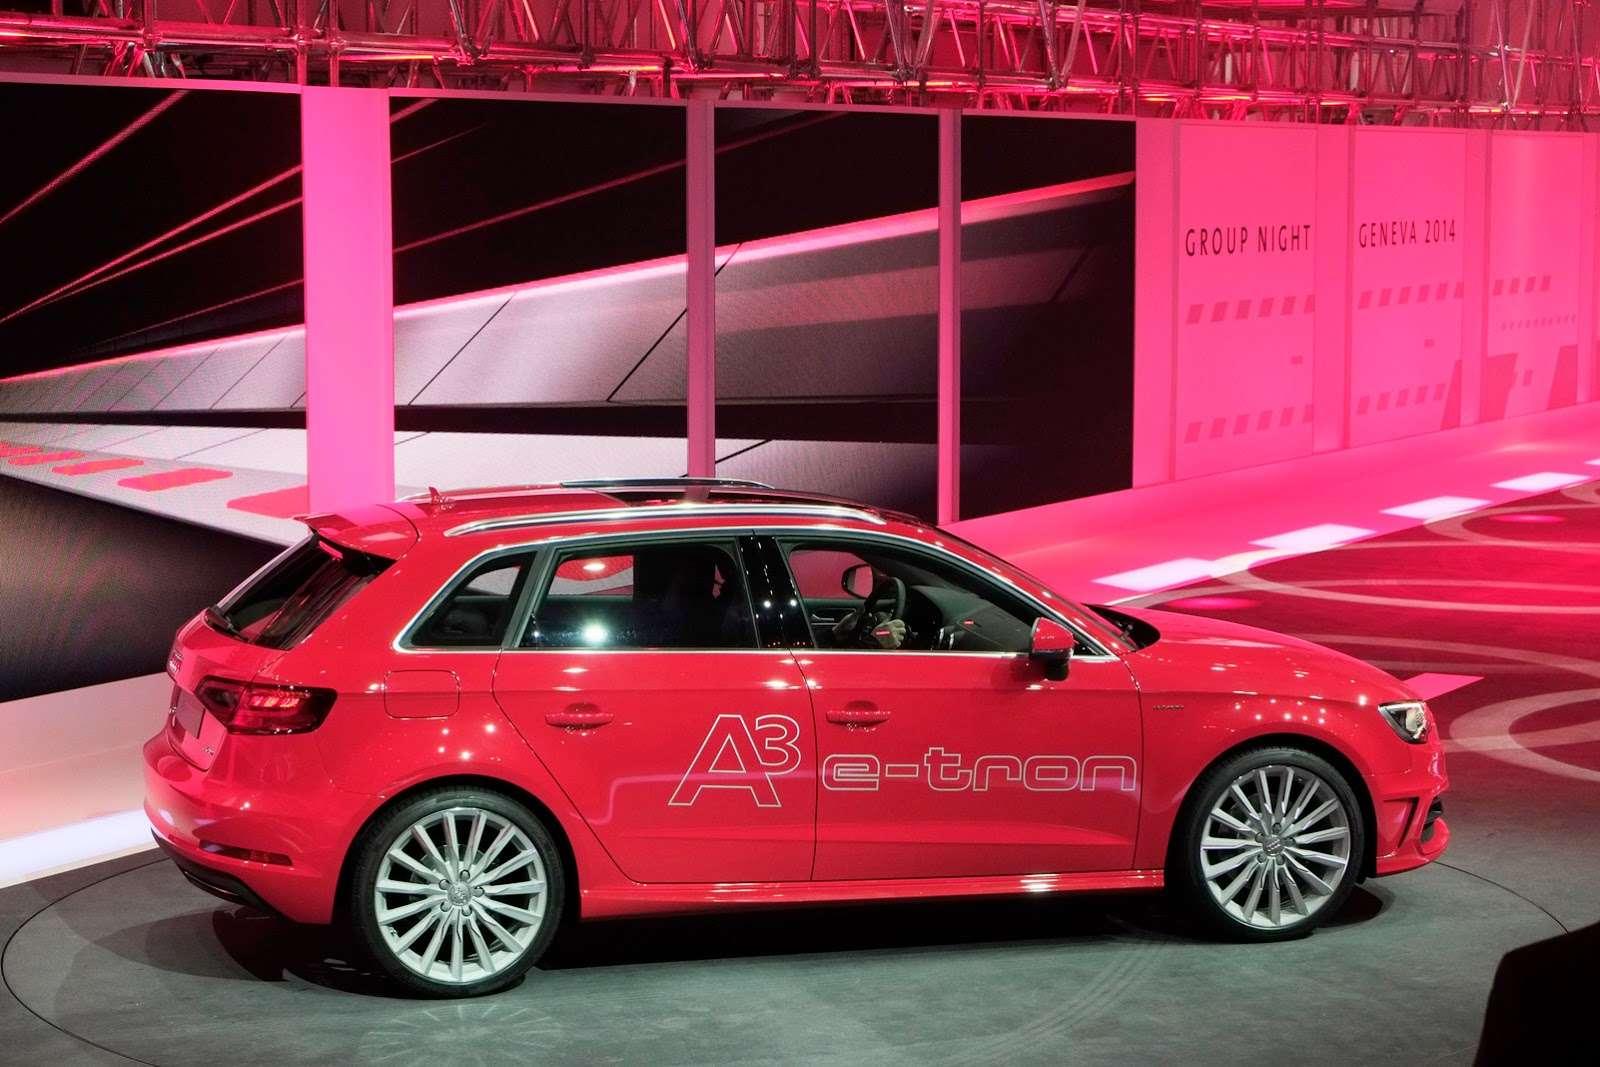 Audi a3 e-tron Geneva 2014